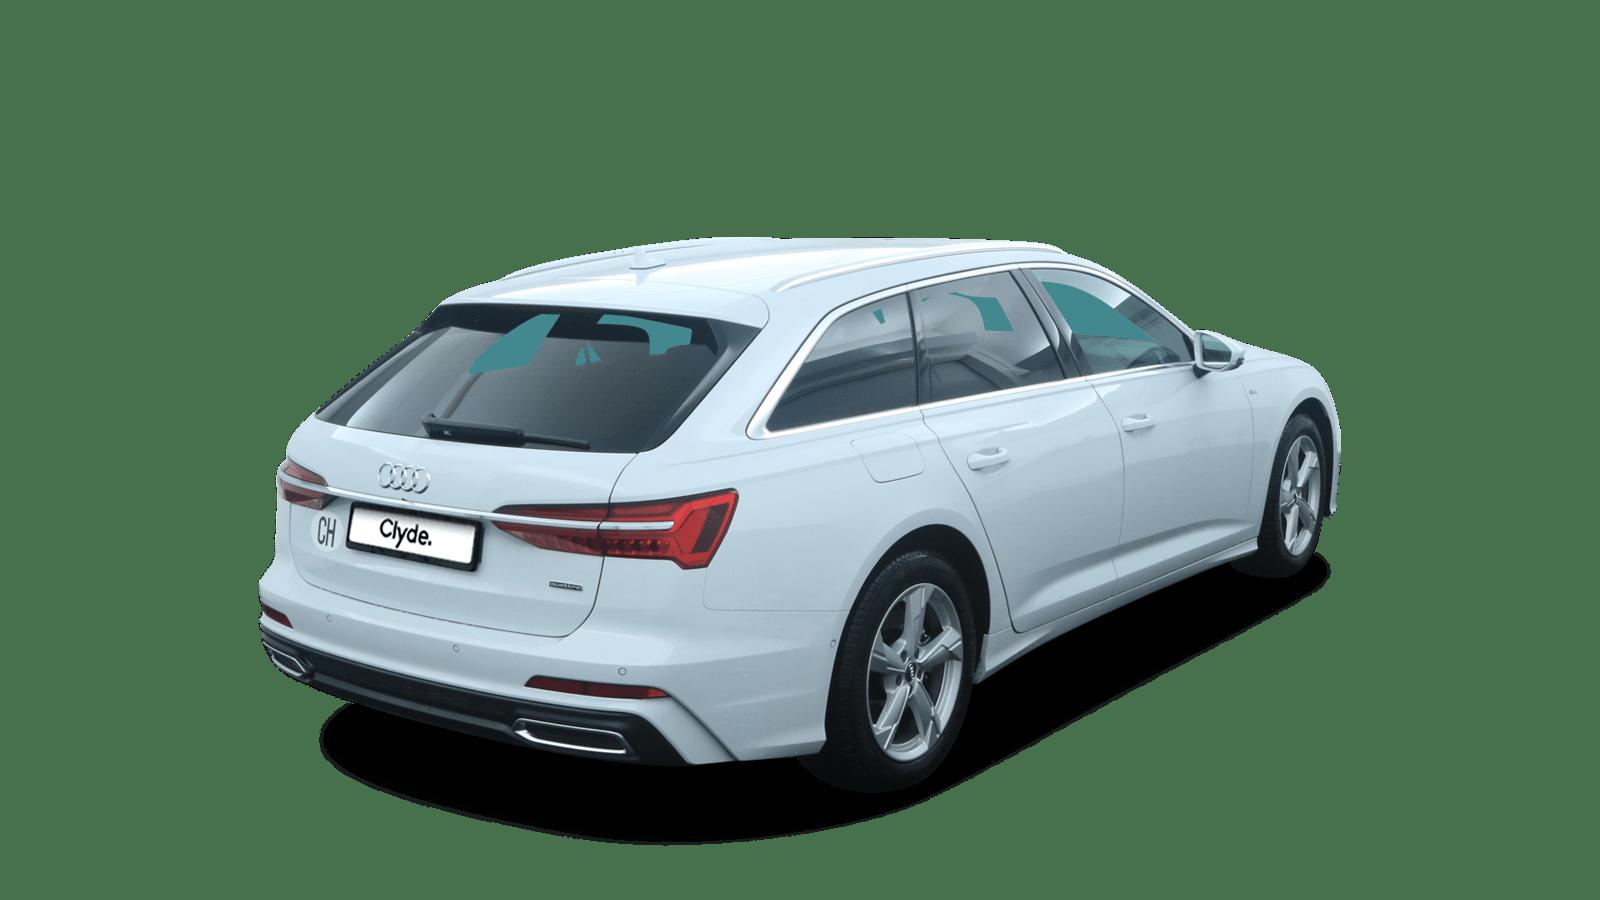 Audi A6 Avant White back - Clyde car subscription